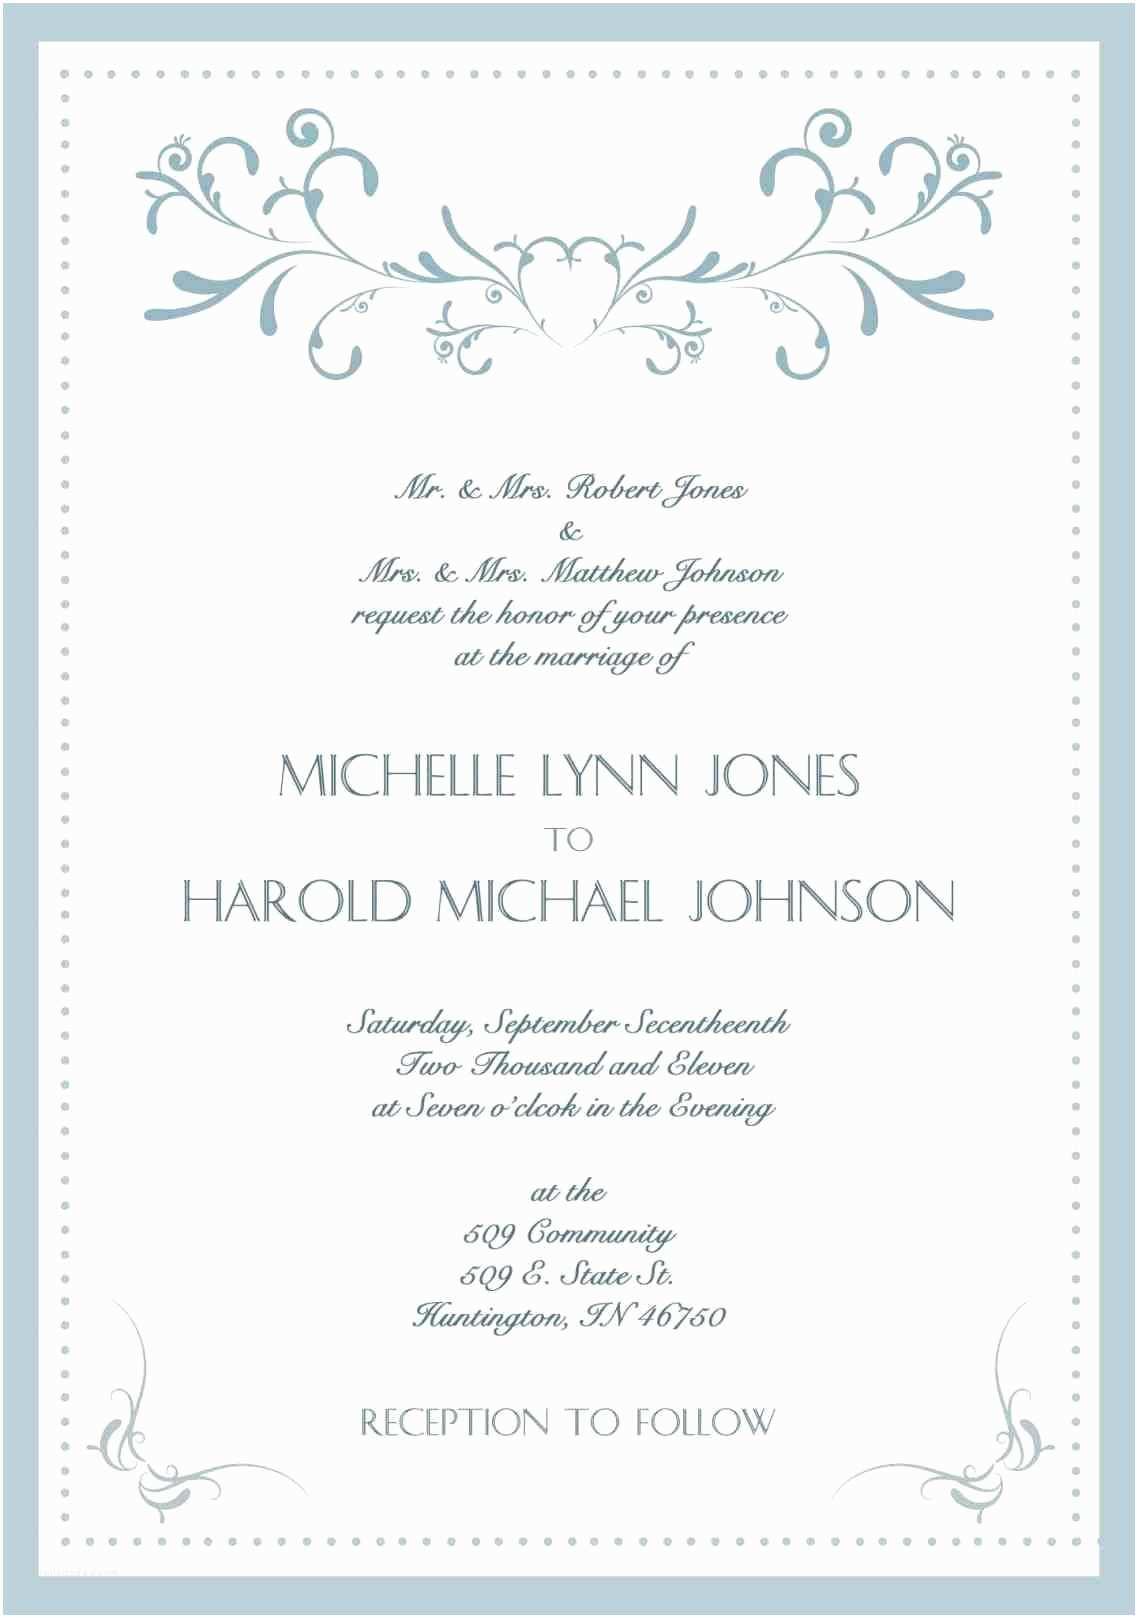 Wedding Invitation Wording Couple Hosting Ideas Wording Wedding Invitation Samples Couple Hosting